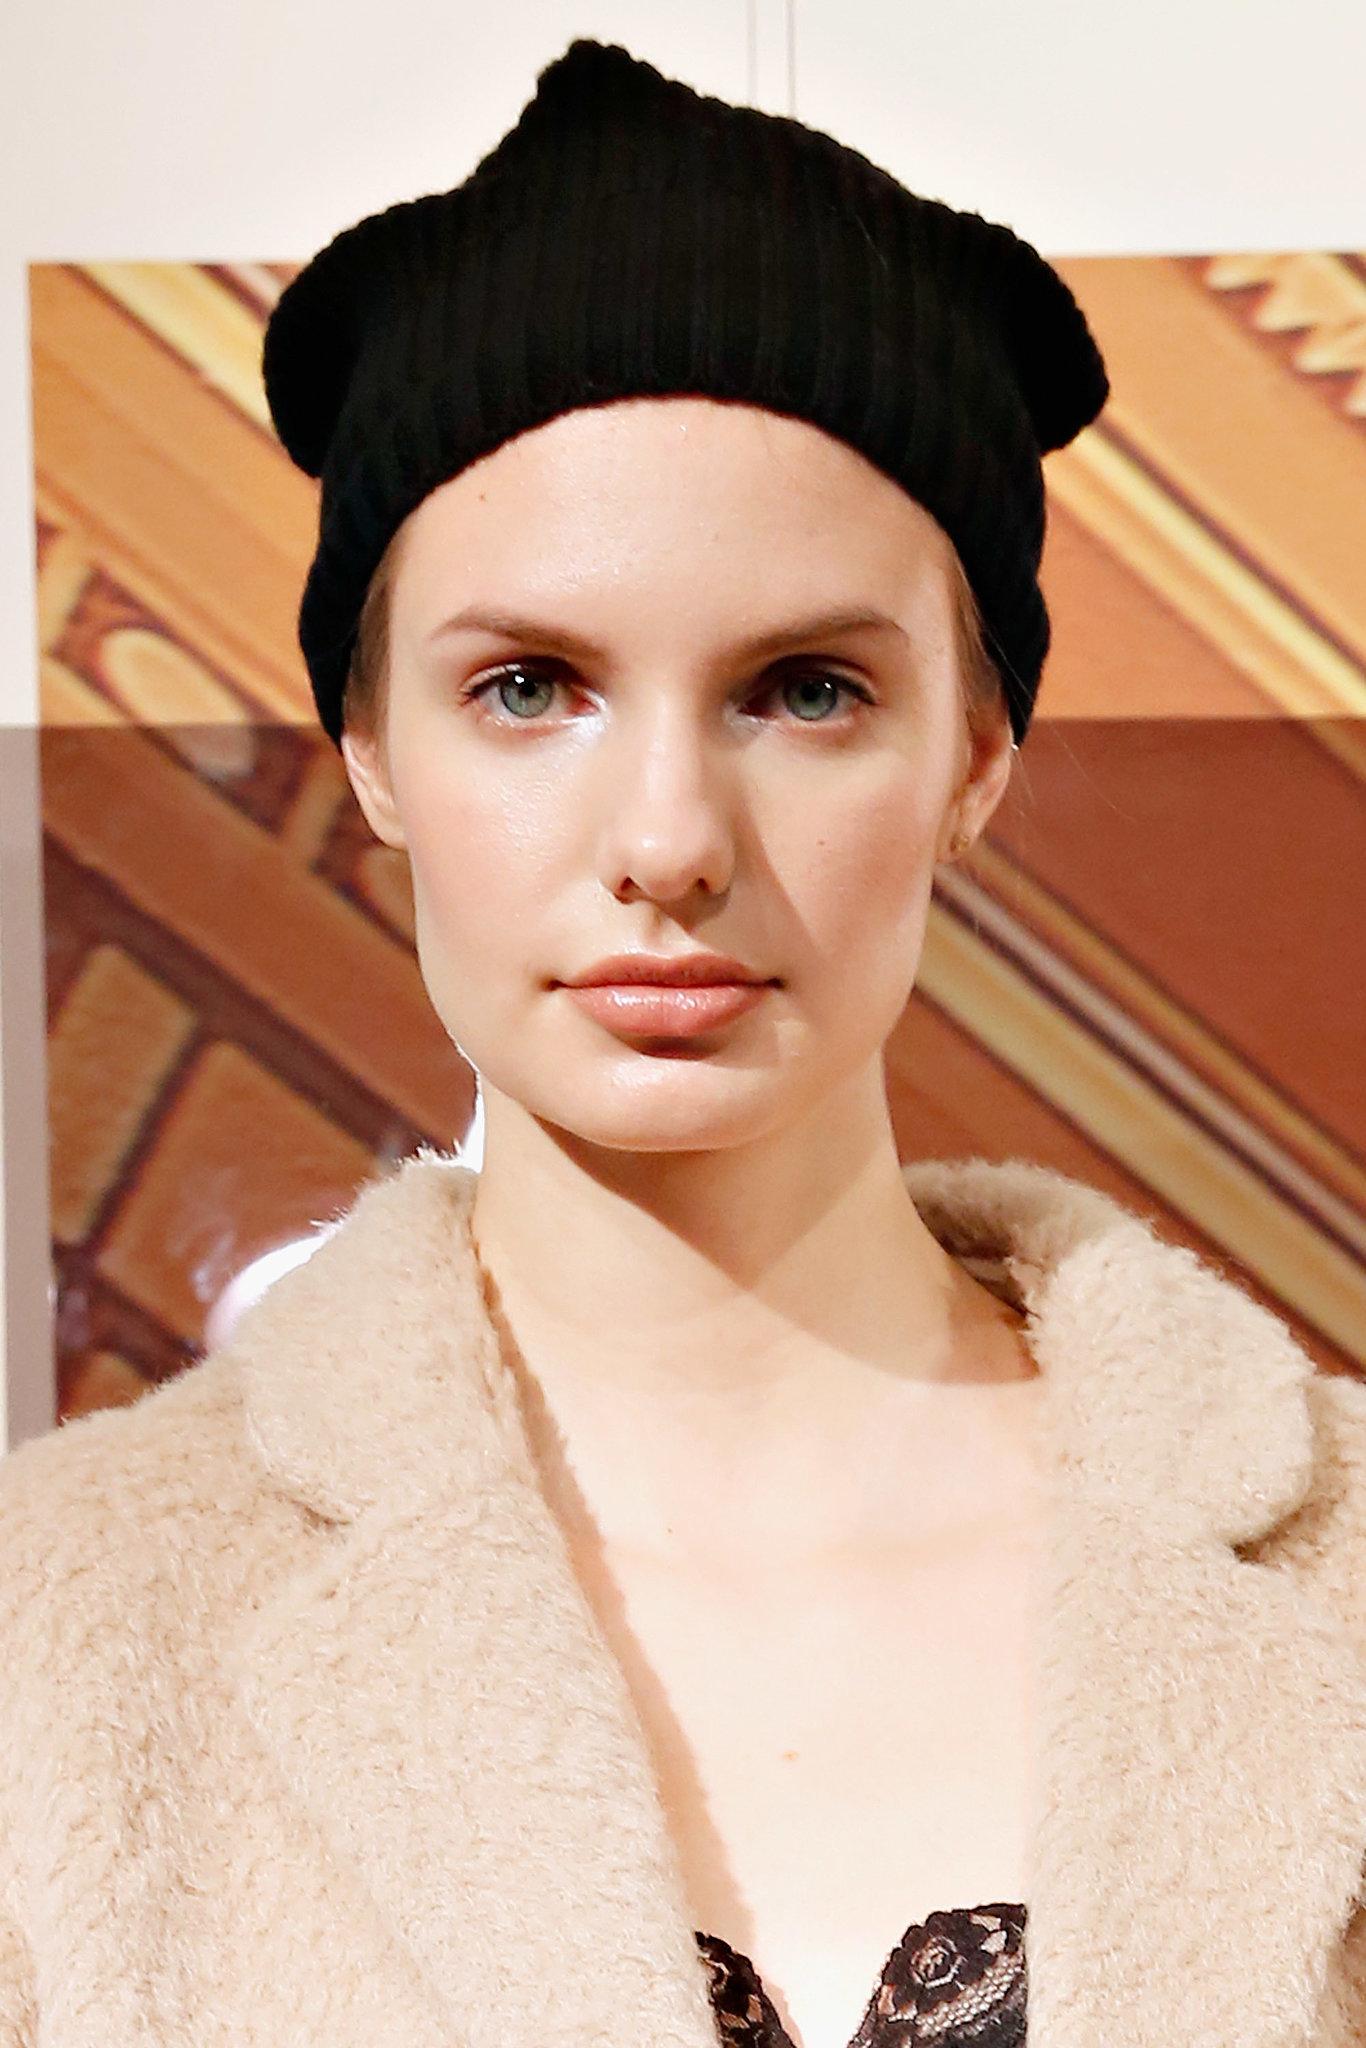 Kate Spade New York Fall 2014